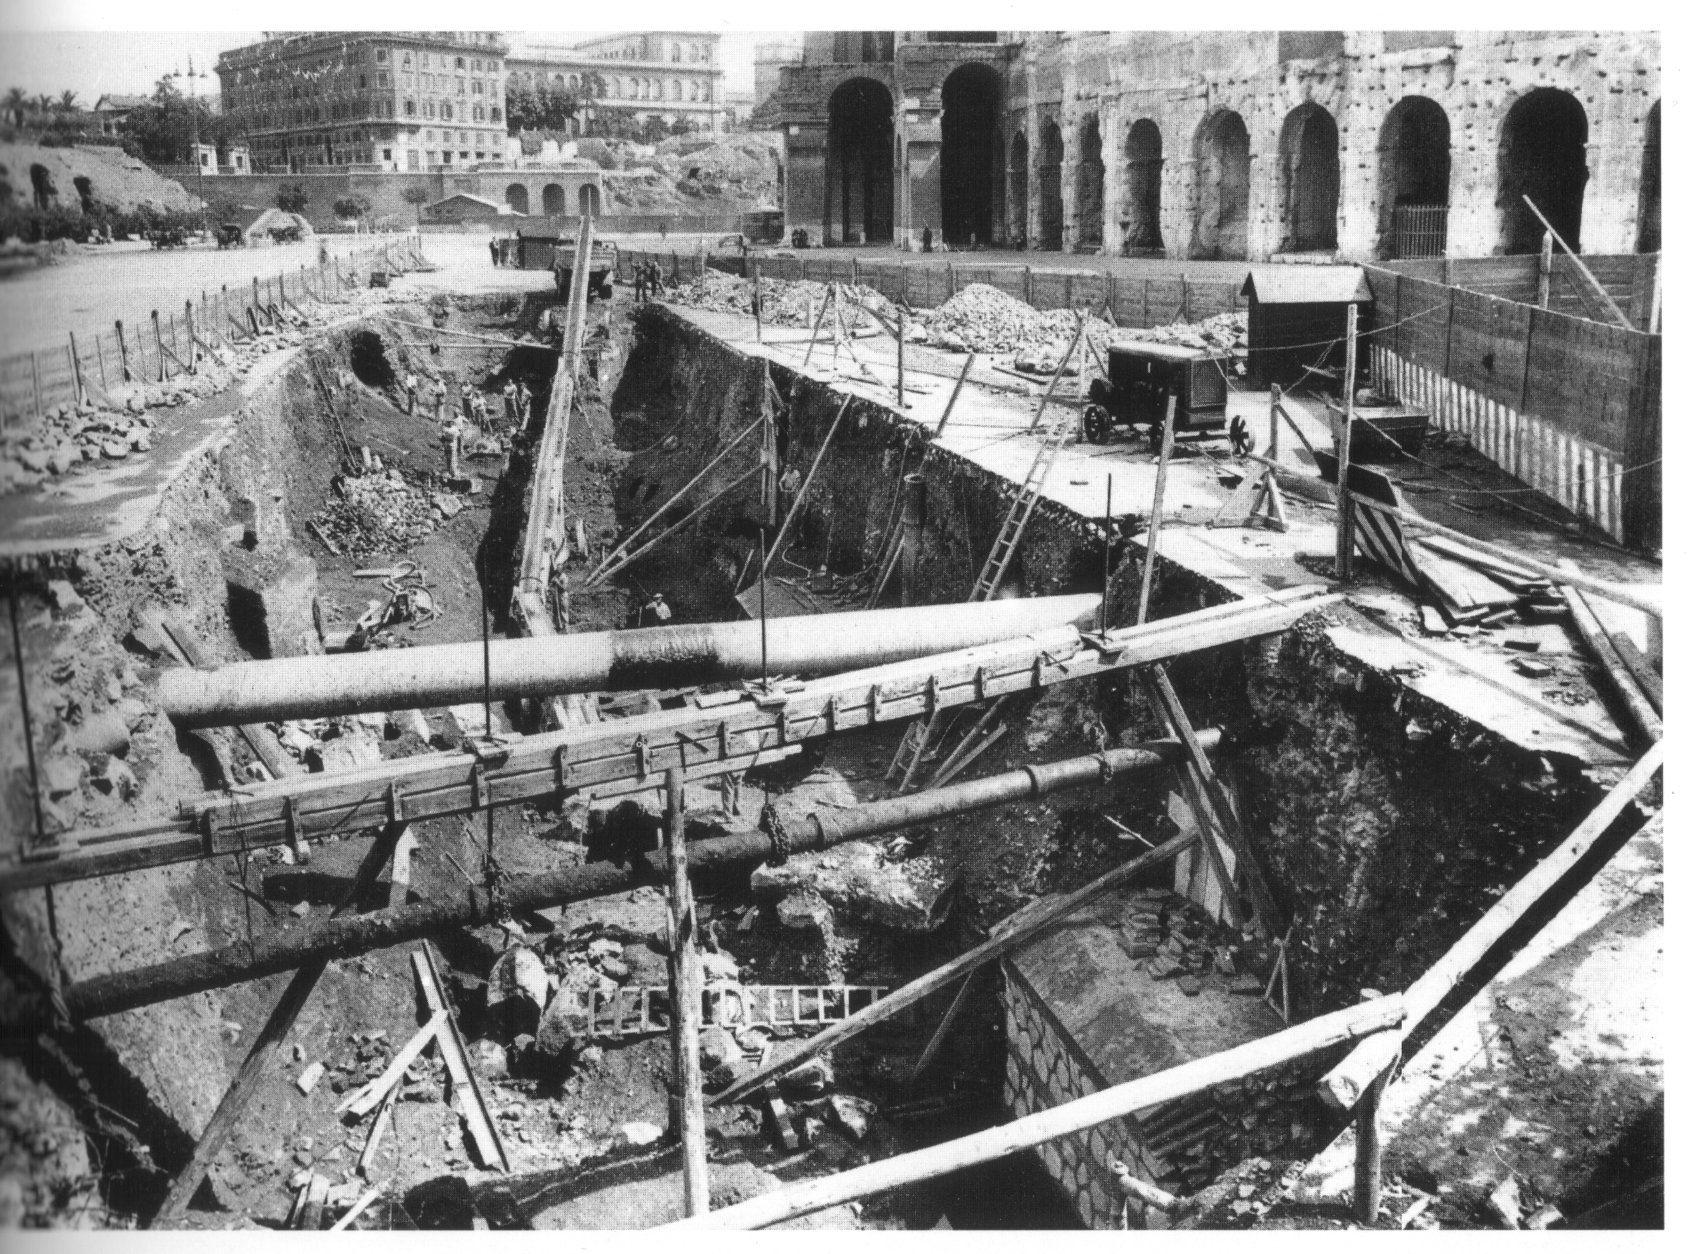 The Colosseum Net Chronology